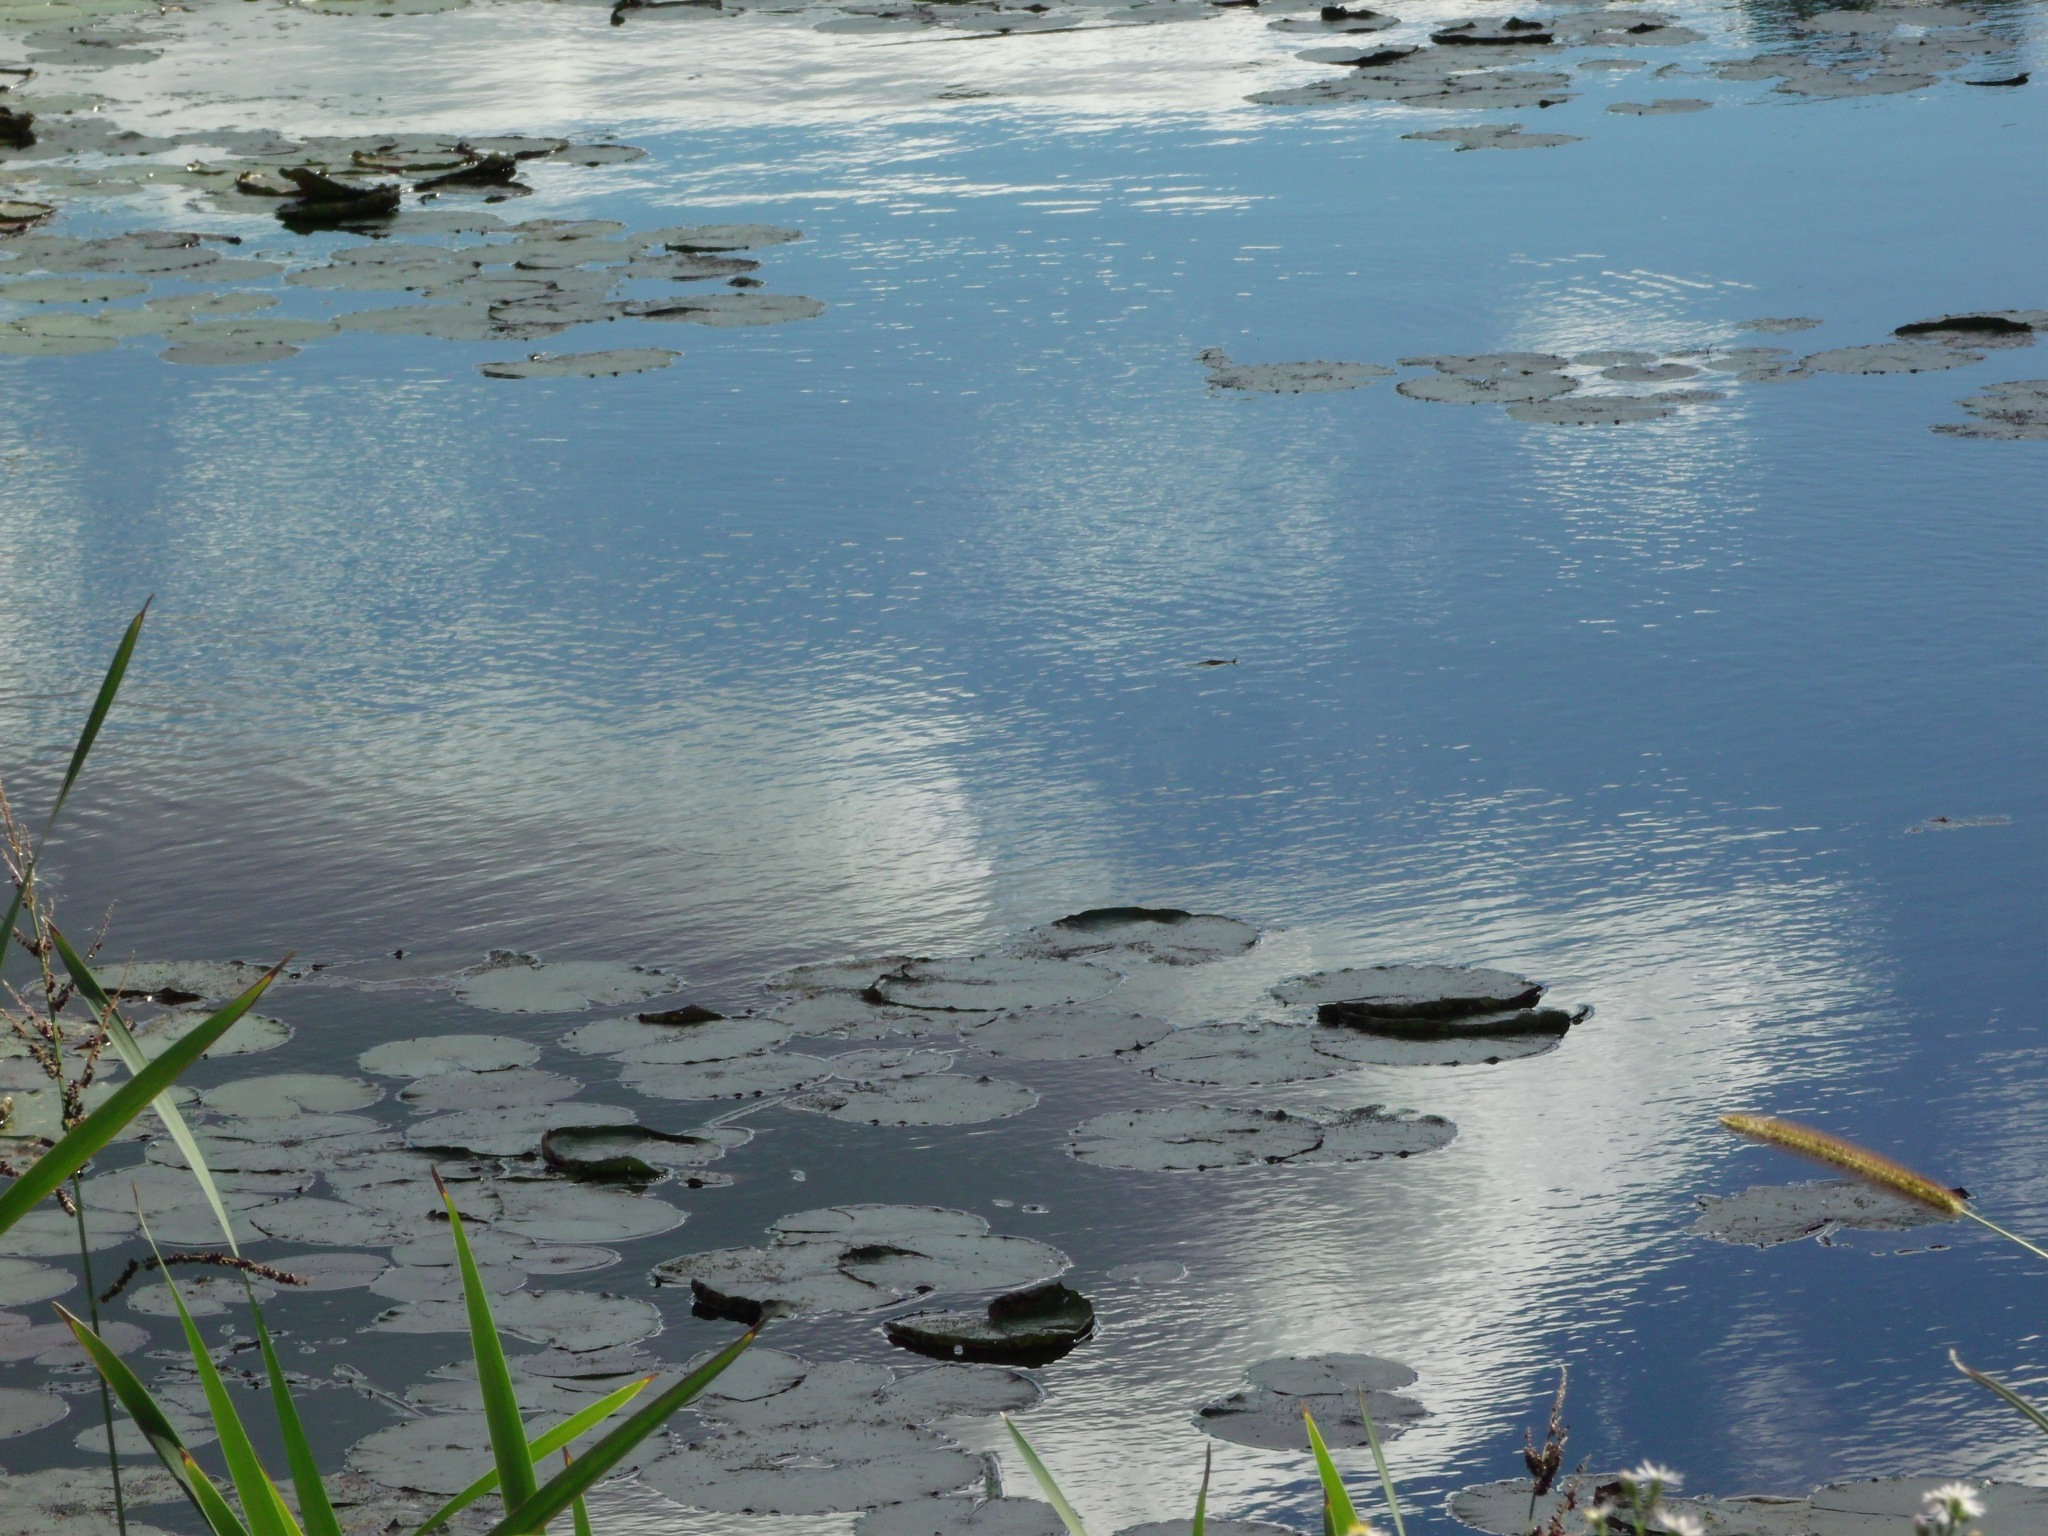 Marsh in September by Stacey J. Cunningham